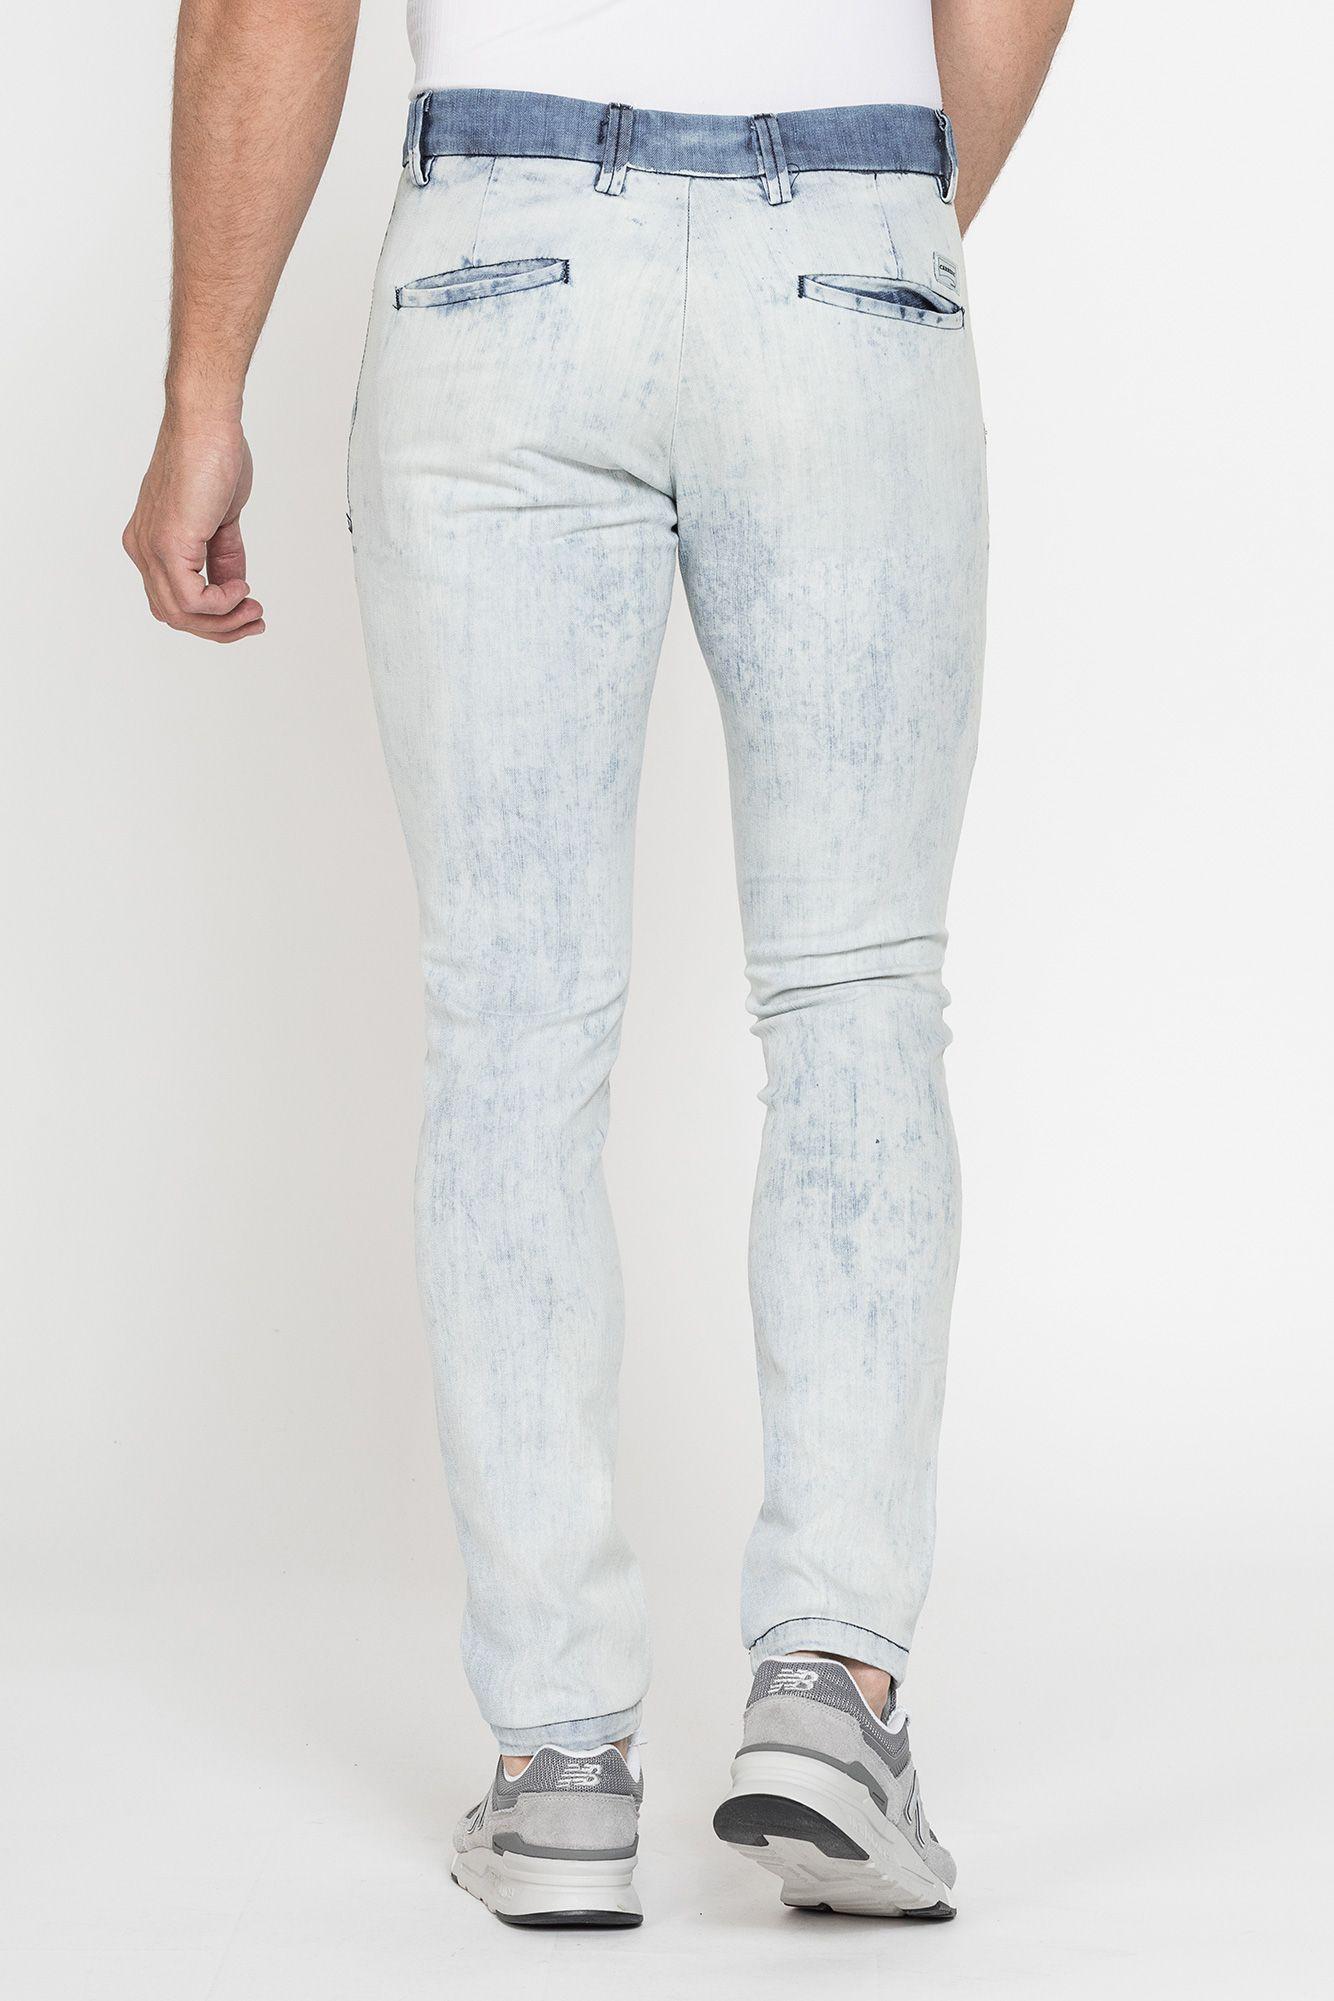 Carrera Jeans Pantalone uomo leggero 617 vita bassa slim fit